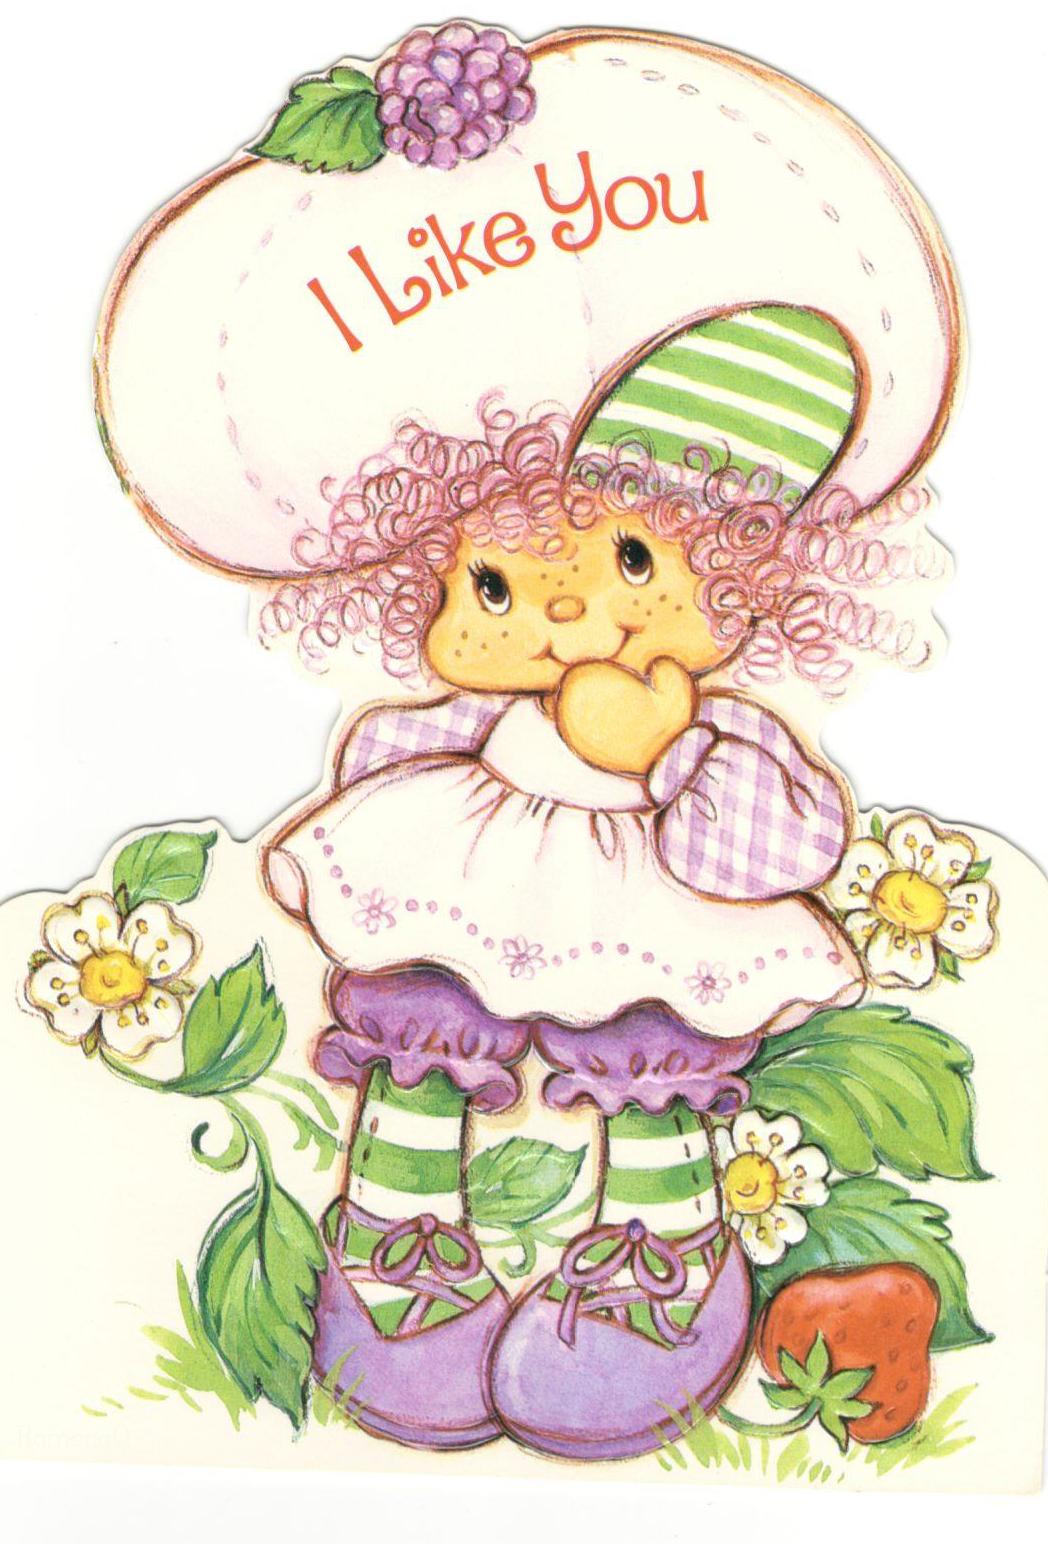 Vintage kenner american greetings strawberry shortcake raspberry vintage kenner american greetings strawberry shortcake raspberry tart i like you card kristyandbryce Choice Image